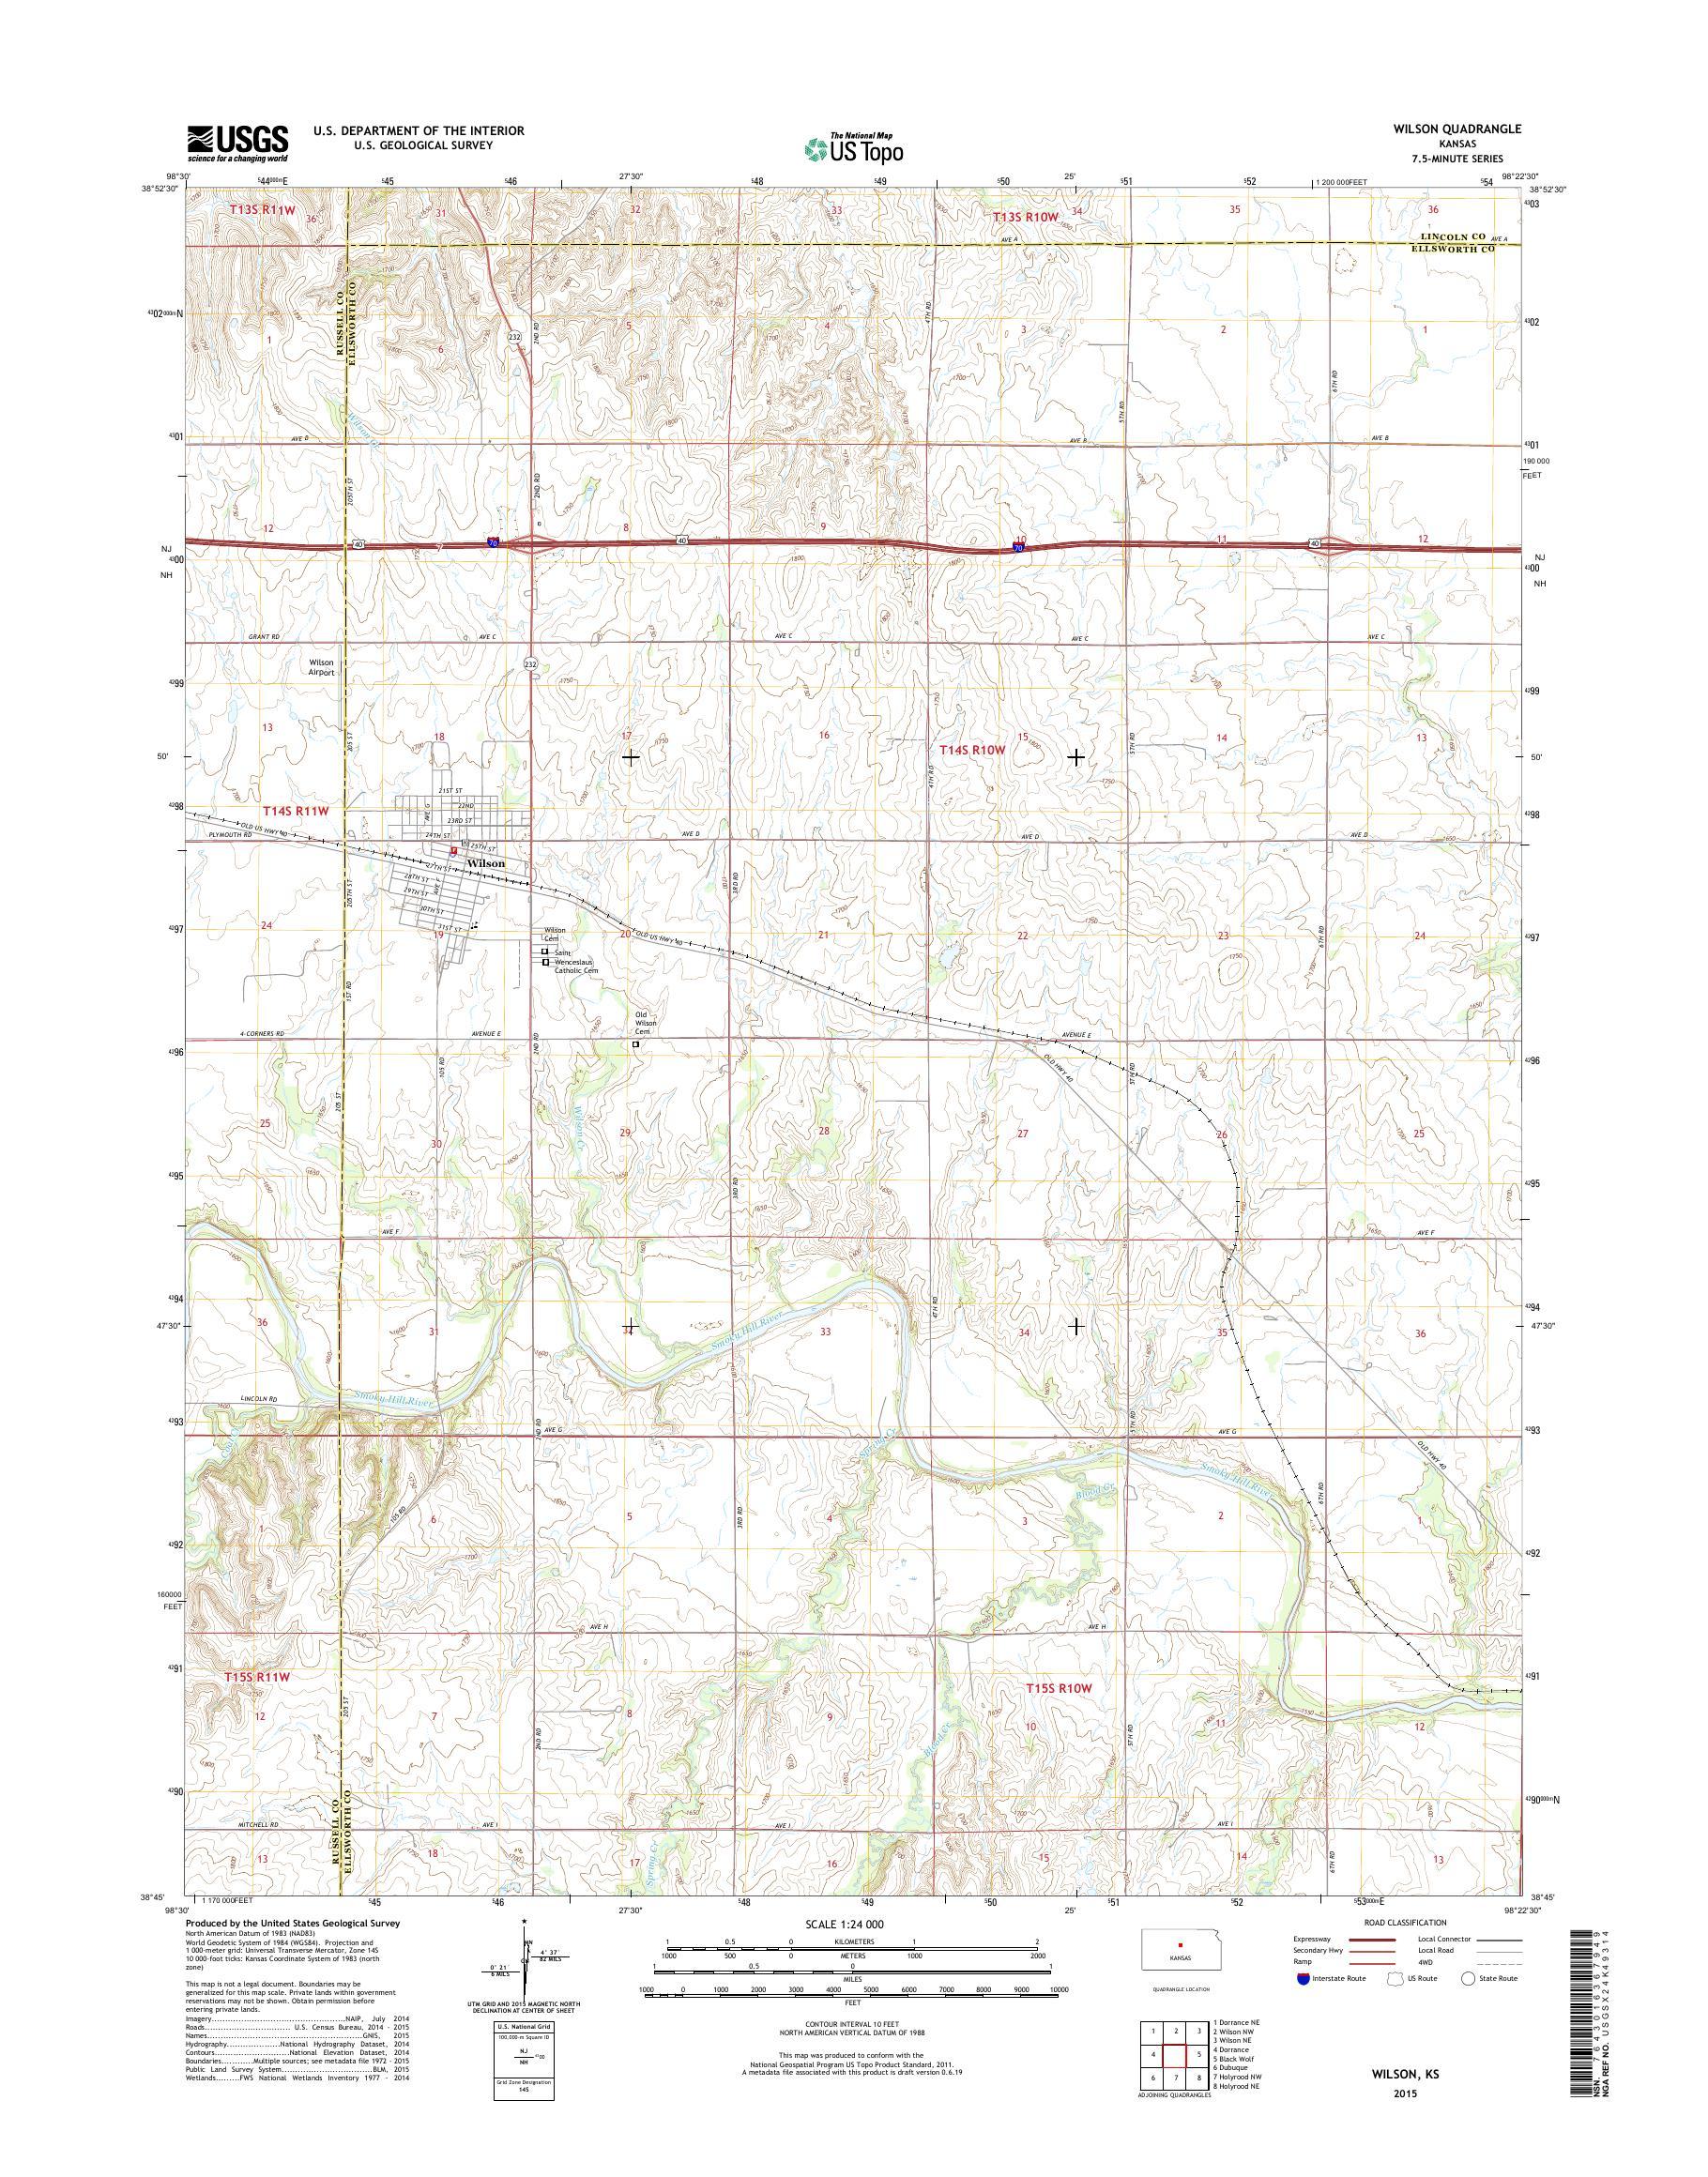 MyTopo Wilson, Kansas USGS Quad Topo Map on elkader kansas map, waverly kansas map, madison kansas map, neosho kansas map, linn county kansas map, fort dodge kansas map, grinnell kansas map, marion kansas map, walnut creek kansas map, wichita falls kansas map, iowa kansas map, topeka kansas map, wamego kansas map, coffeyville kansas map, scott county kansas map, beloit kansas map, salina kansas map, liberal kansas map, winona kansas map, desoto kansas map,